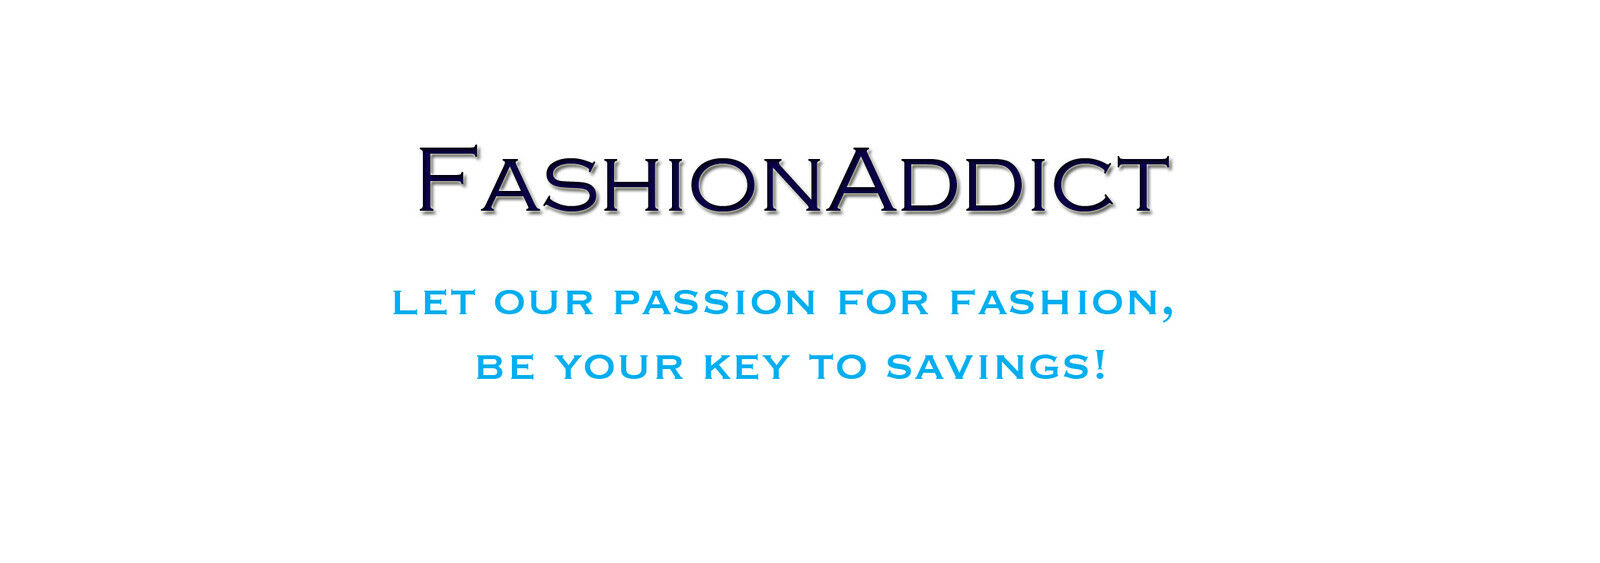 FashionAddict1023